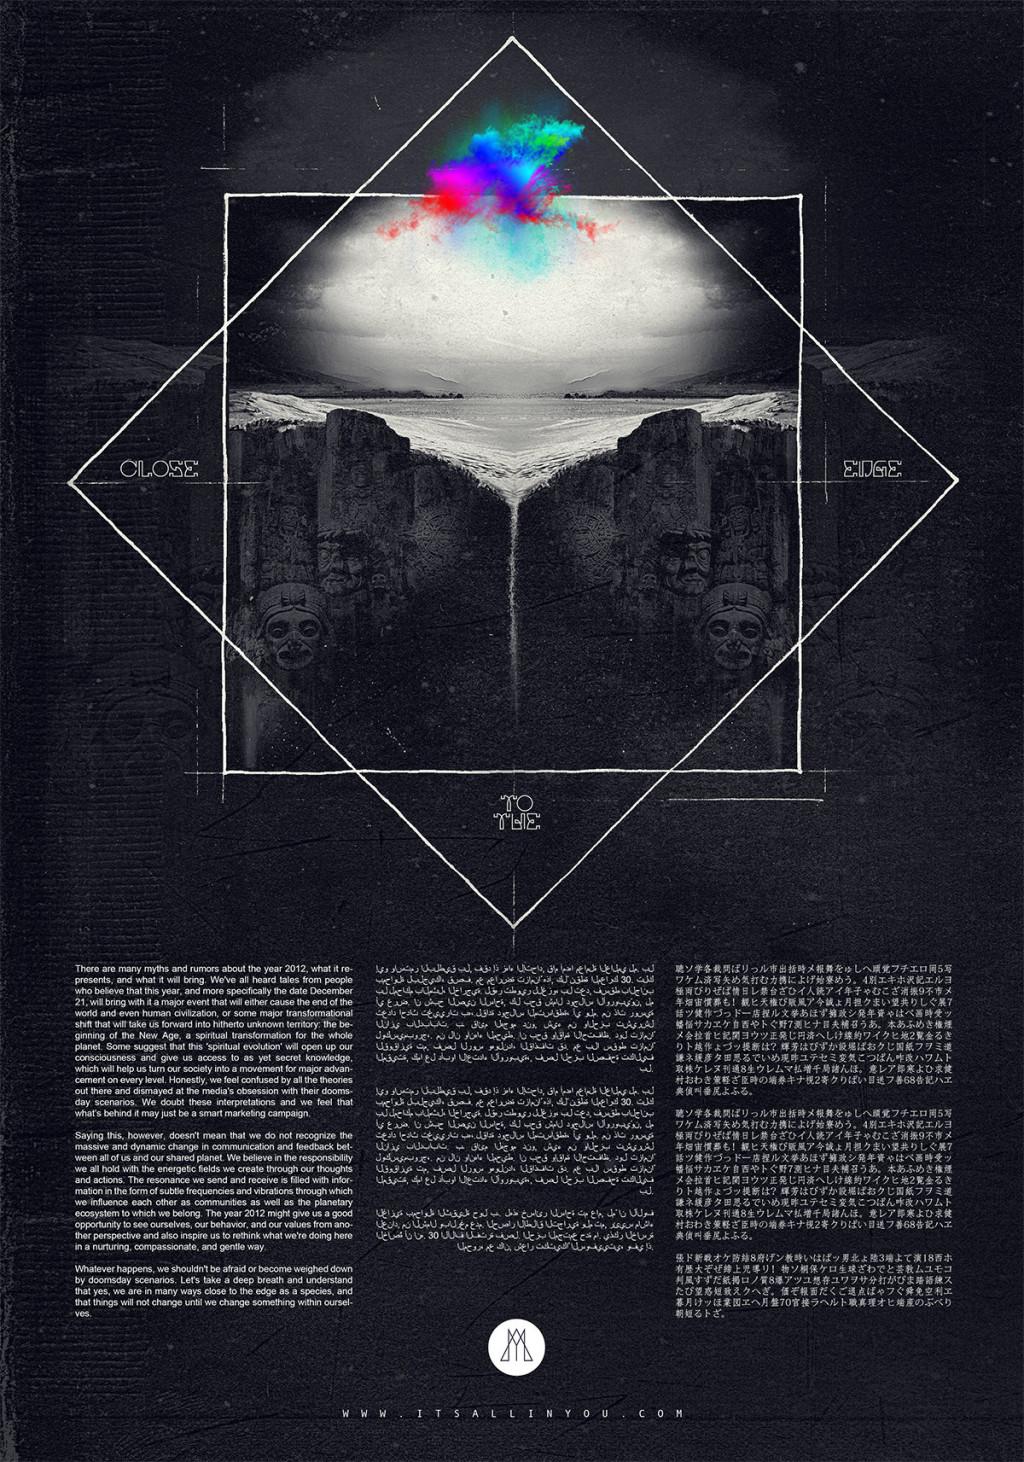 Florian Fischer - Multidisciplianary Designer based in Berlin